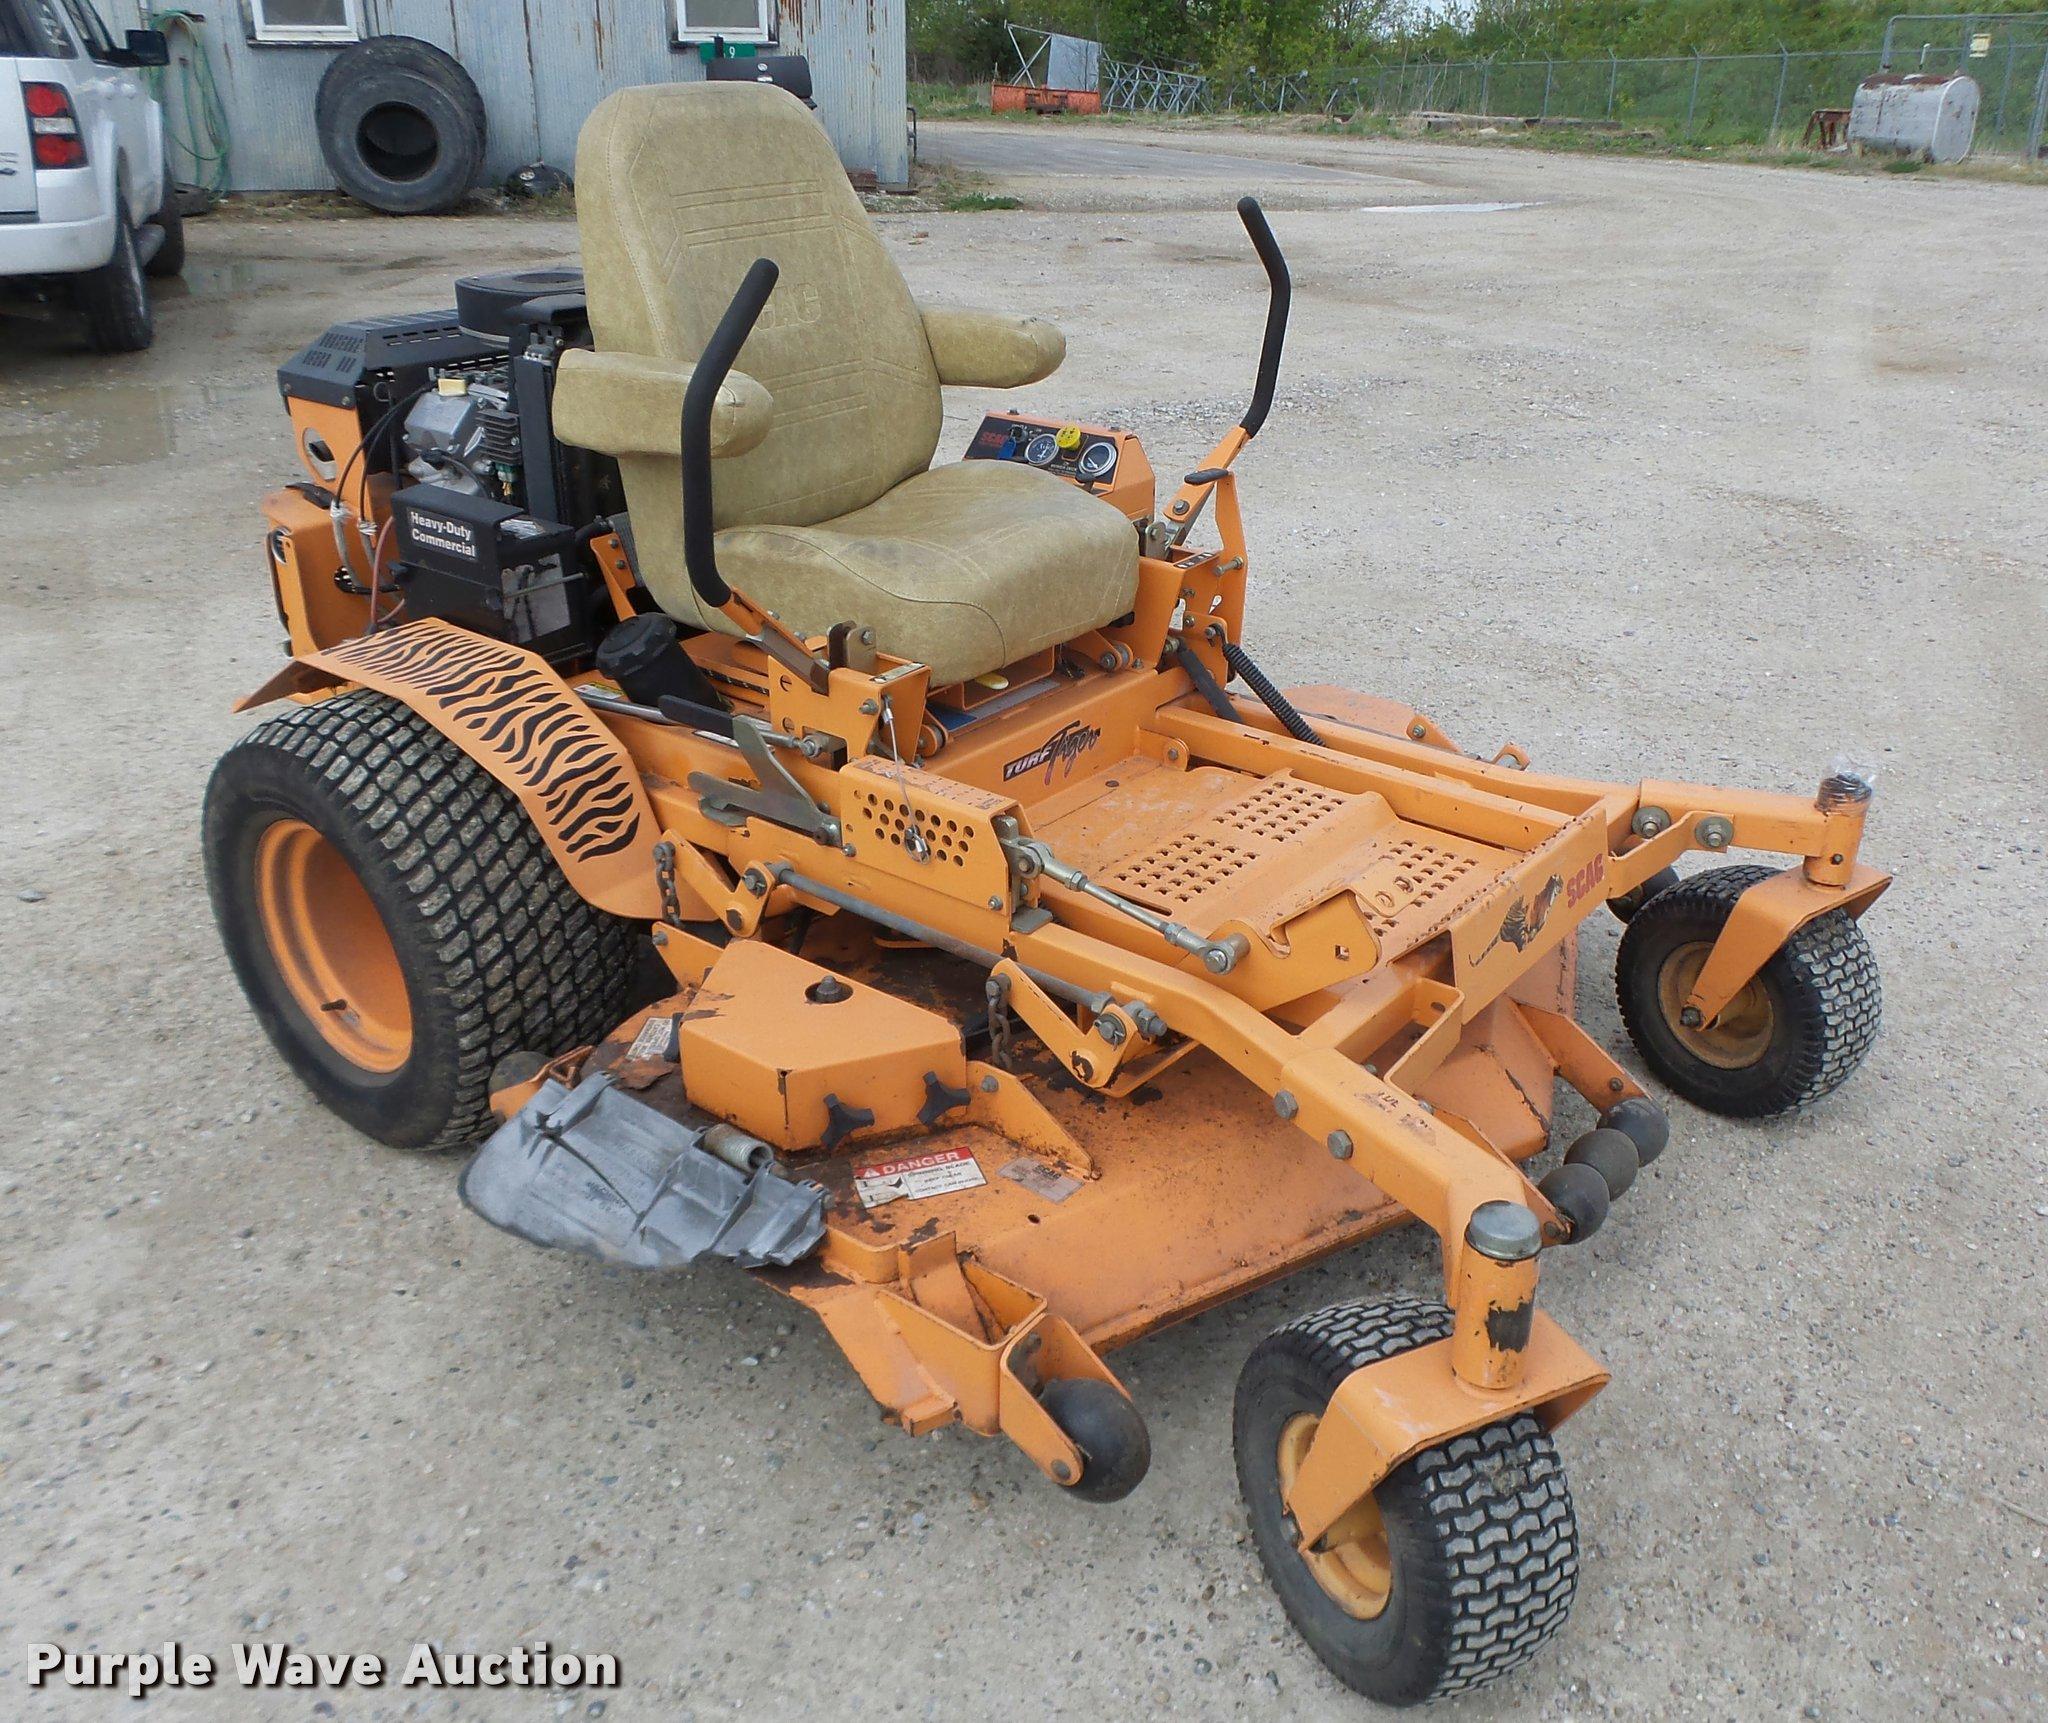 Turf Tiger SMT-61A lawn mower | Item DA3479 | SOLD! June 21